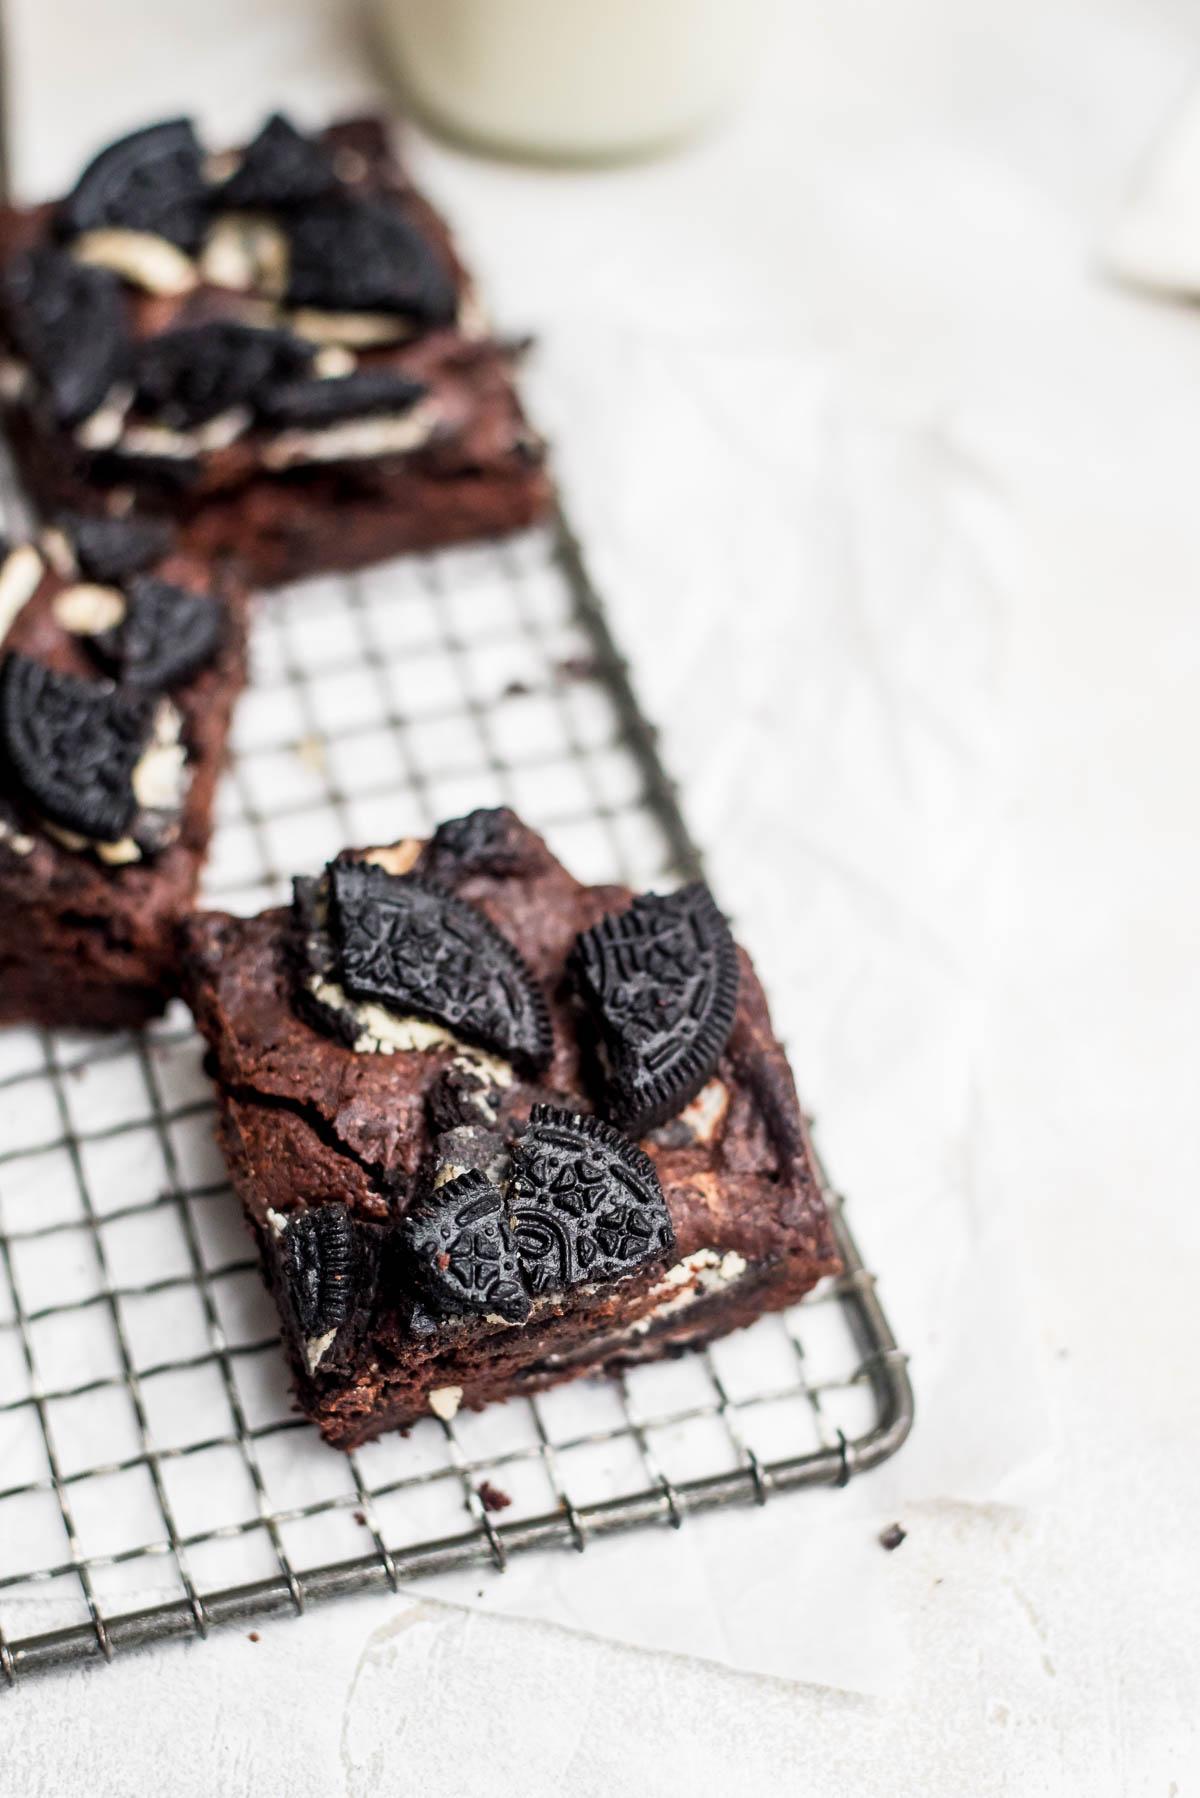 brownies on wire rack